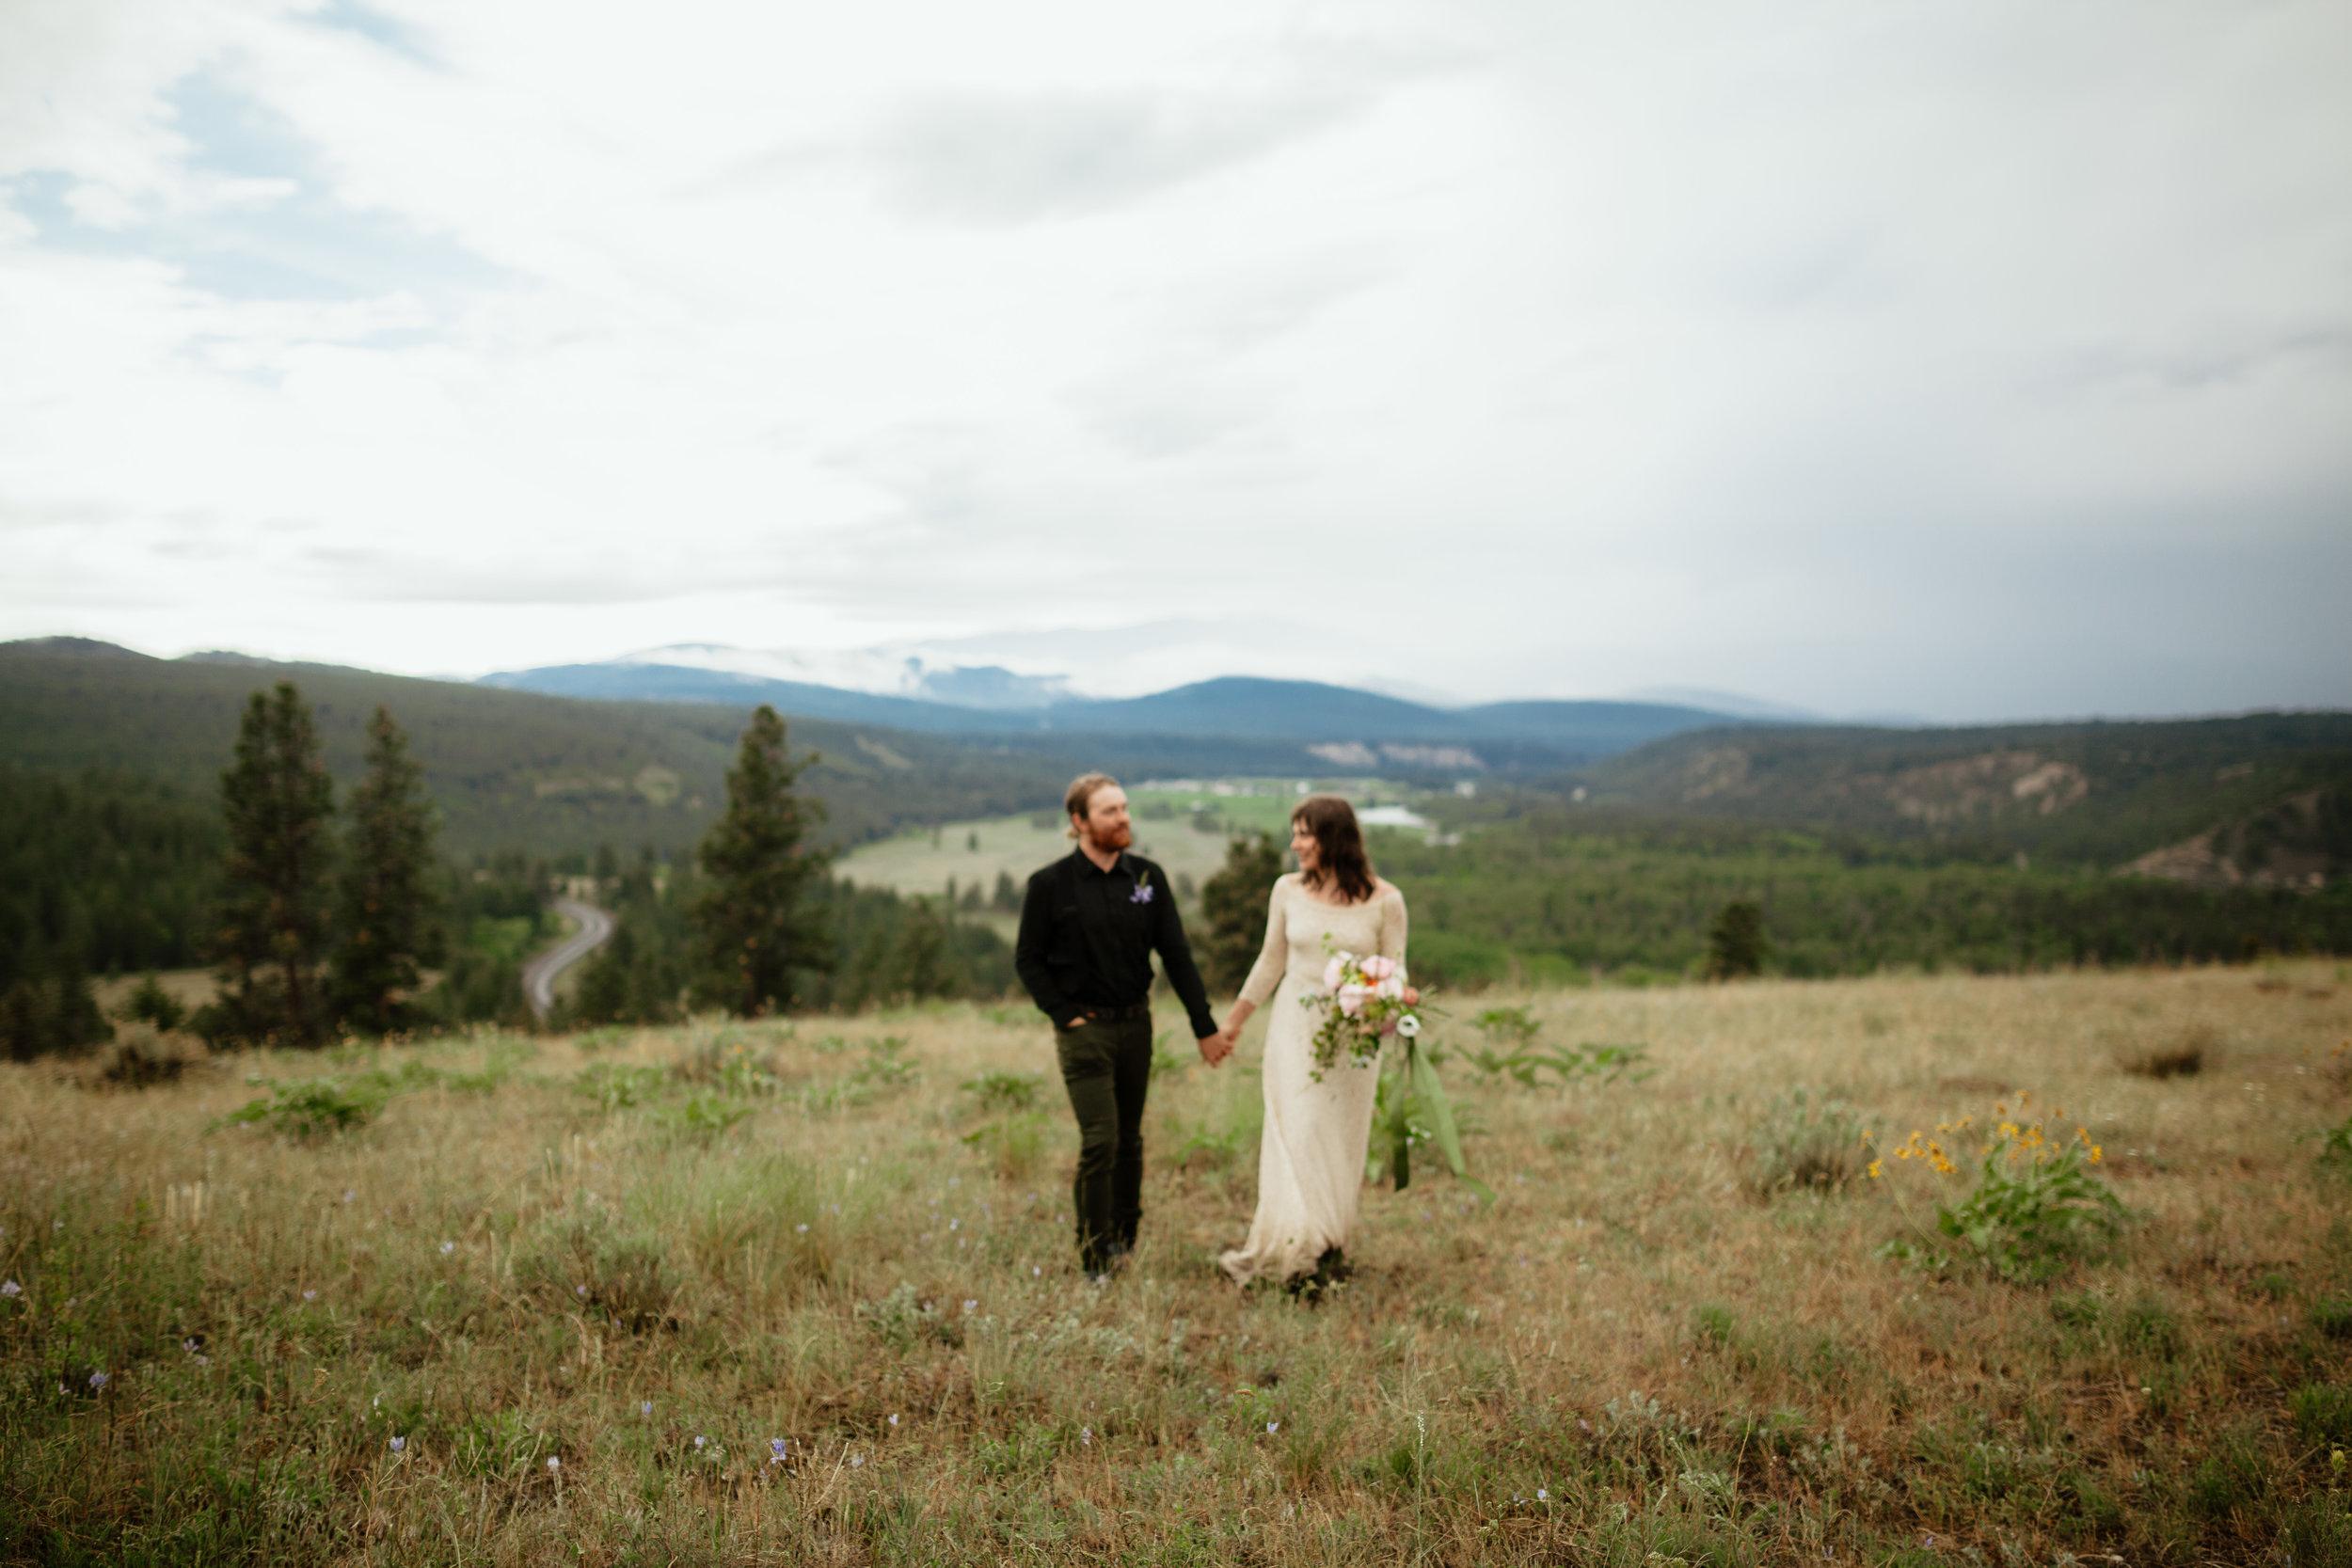 Casey + Anna 3 - Bridal Portraits-78.jpg